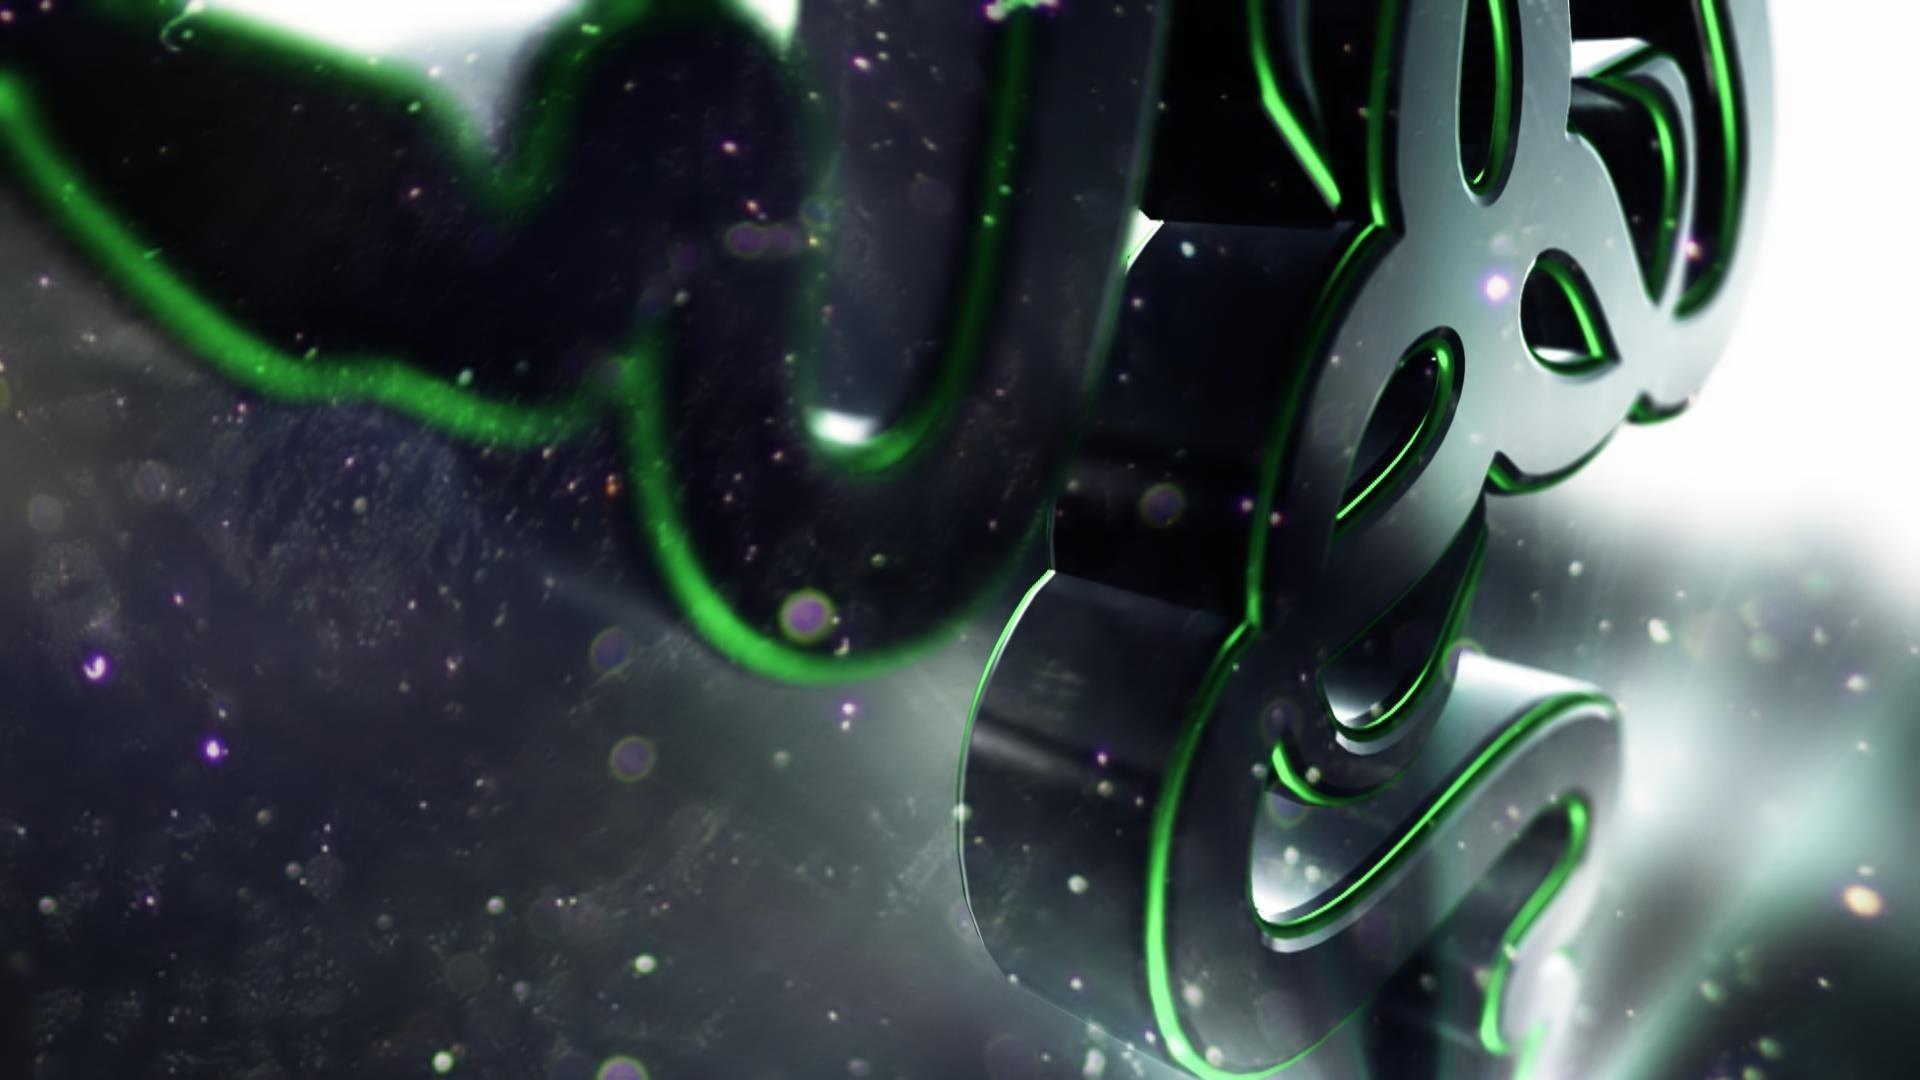 Full HD 1080p Hi-Tech Wallpapers, Desktop Backgrounds HD, Pictures